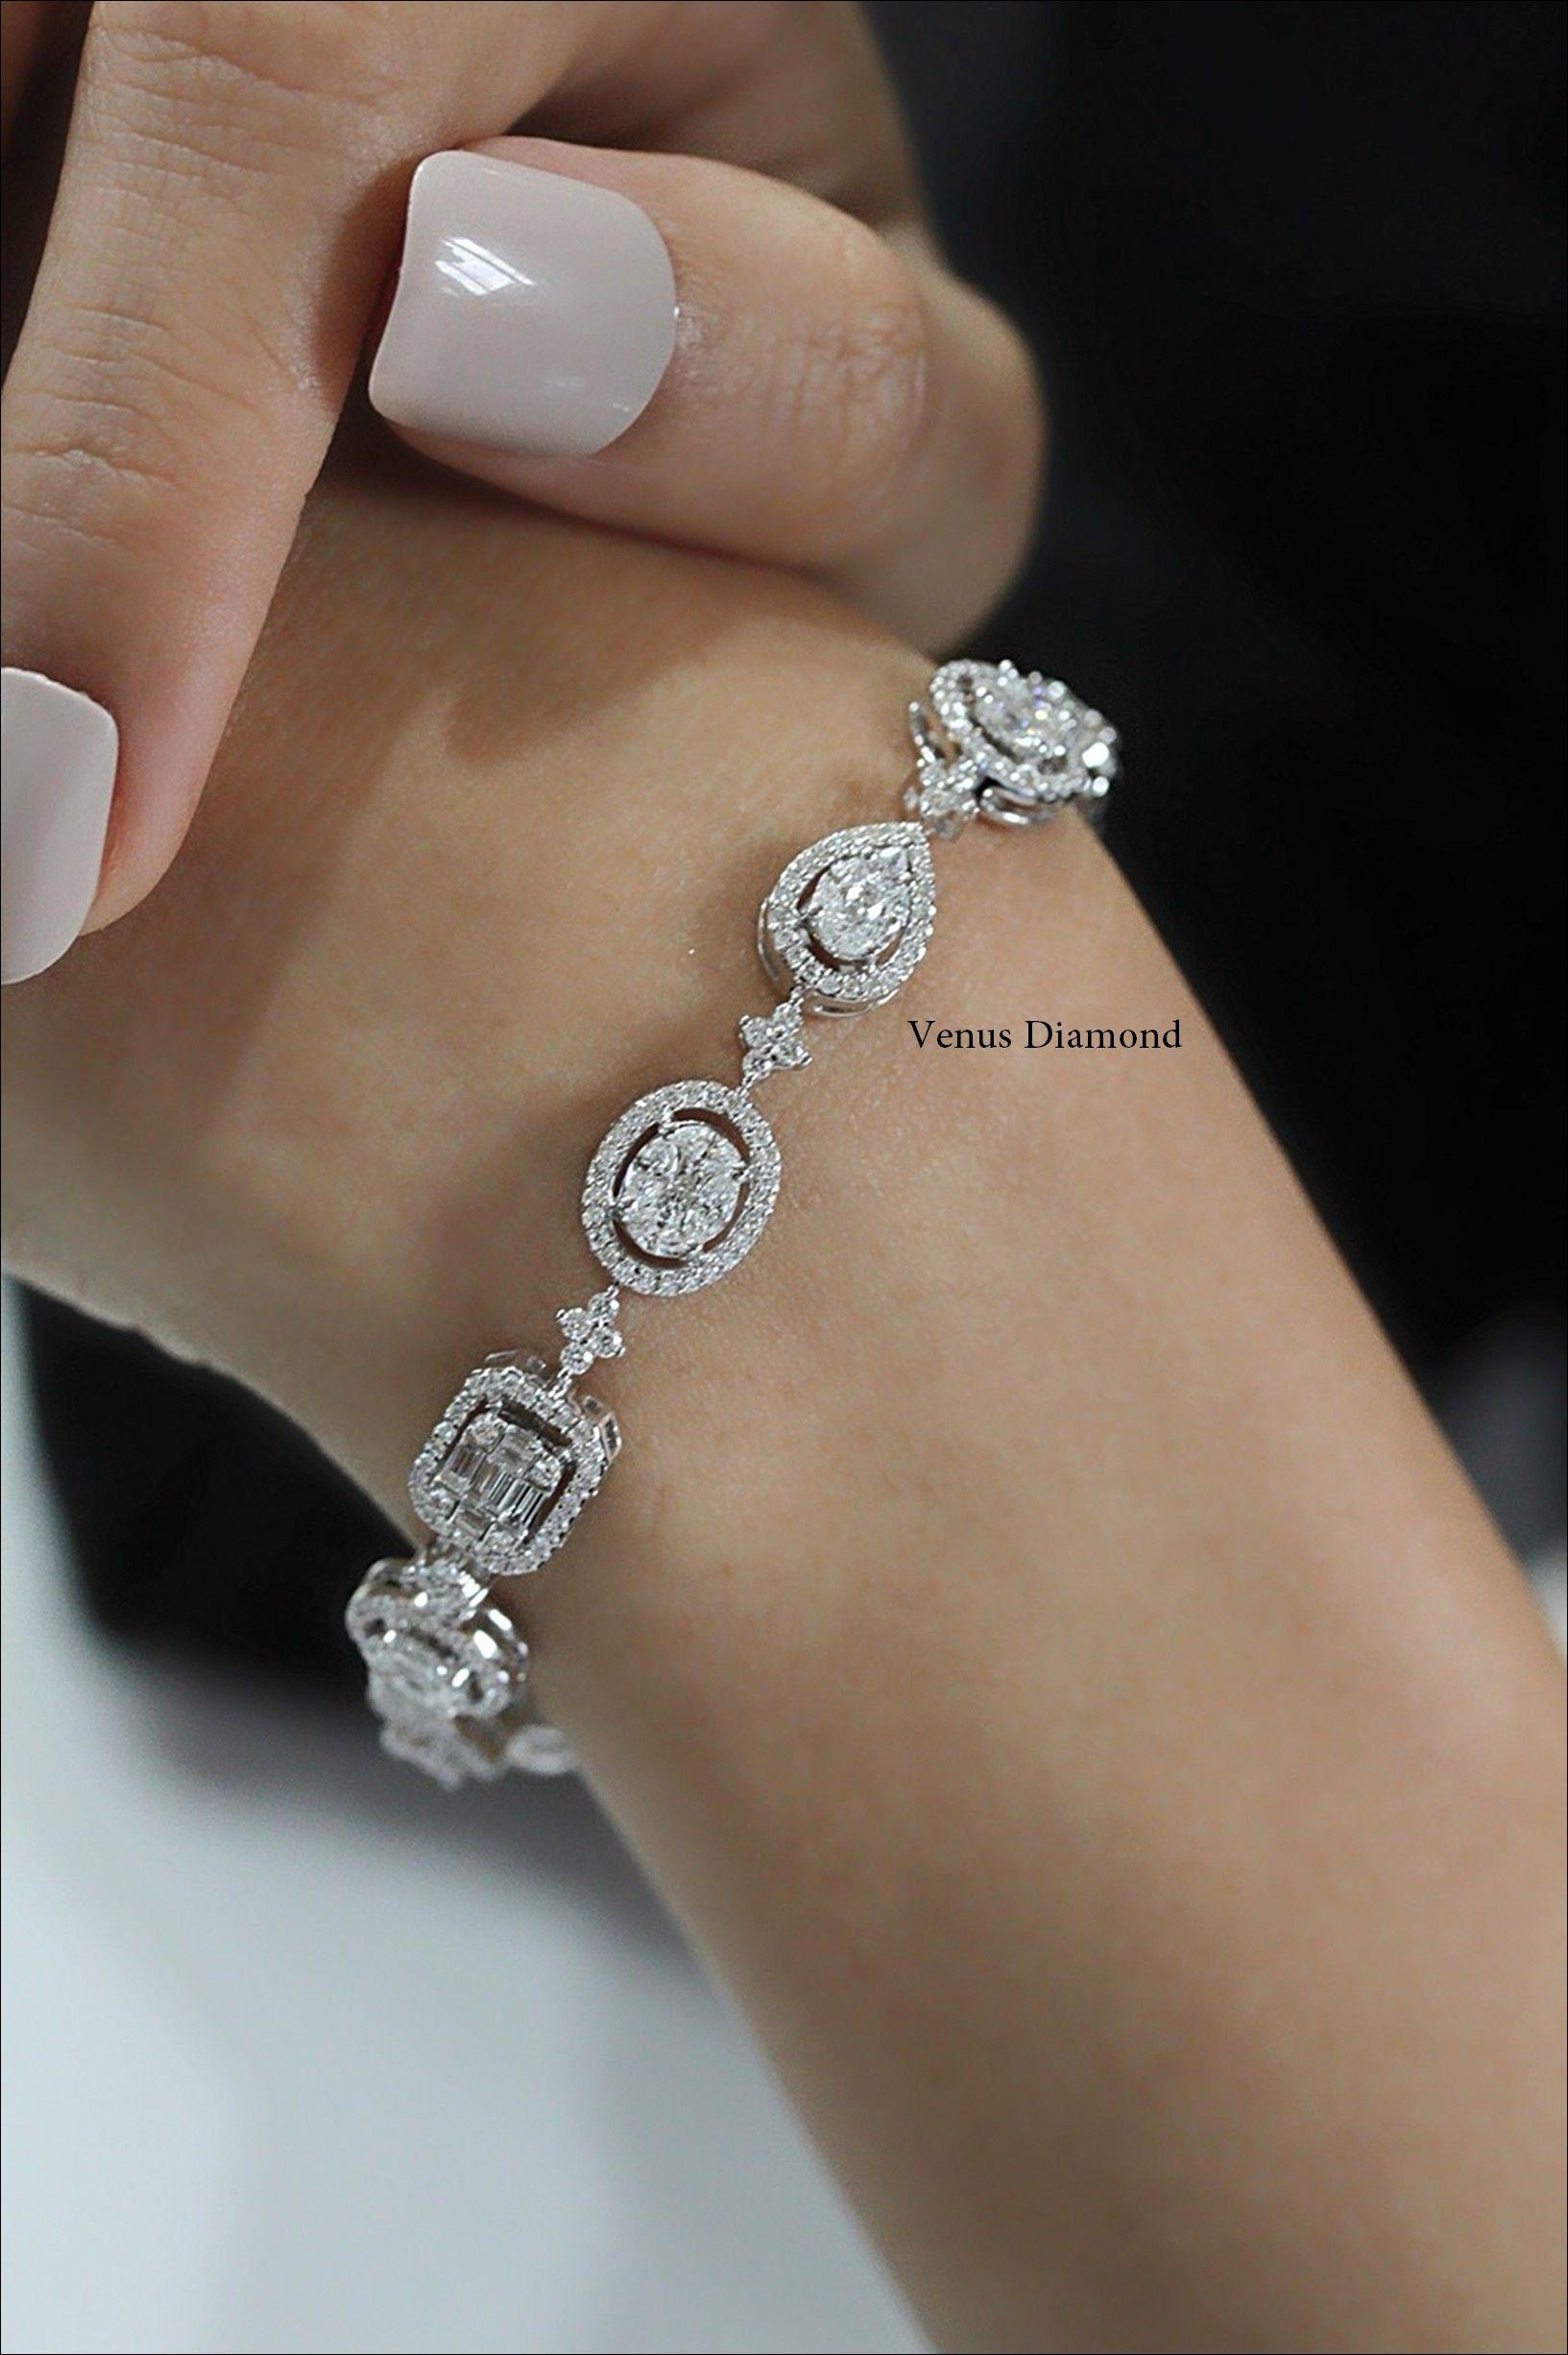 Illusion Setting Diamond Tennis Bracelet Tennis Bracelet Diamond Jewelry Tennis Bracelet